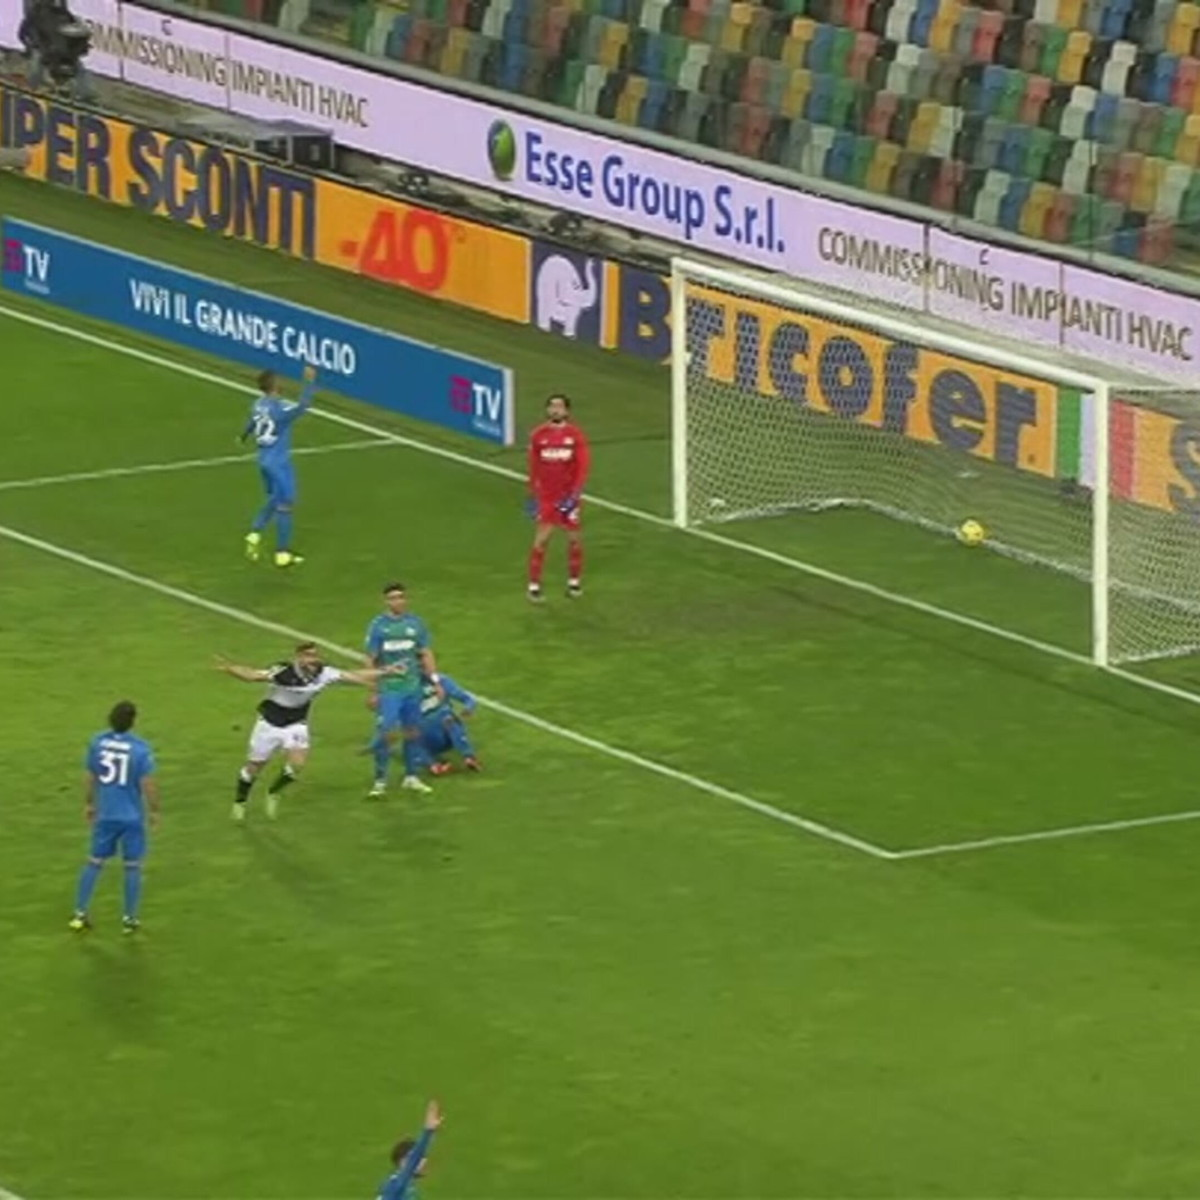 Udinese-Sassuolo 2-0: gli highlights